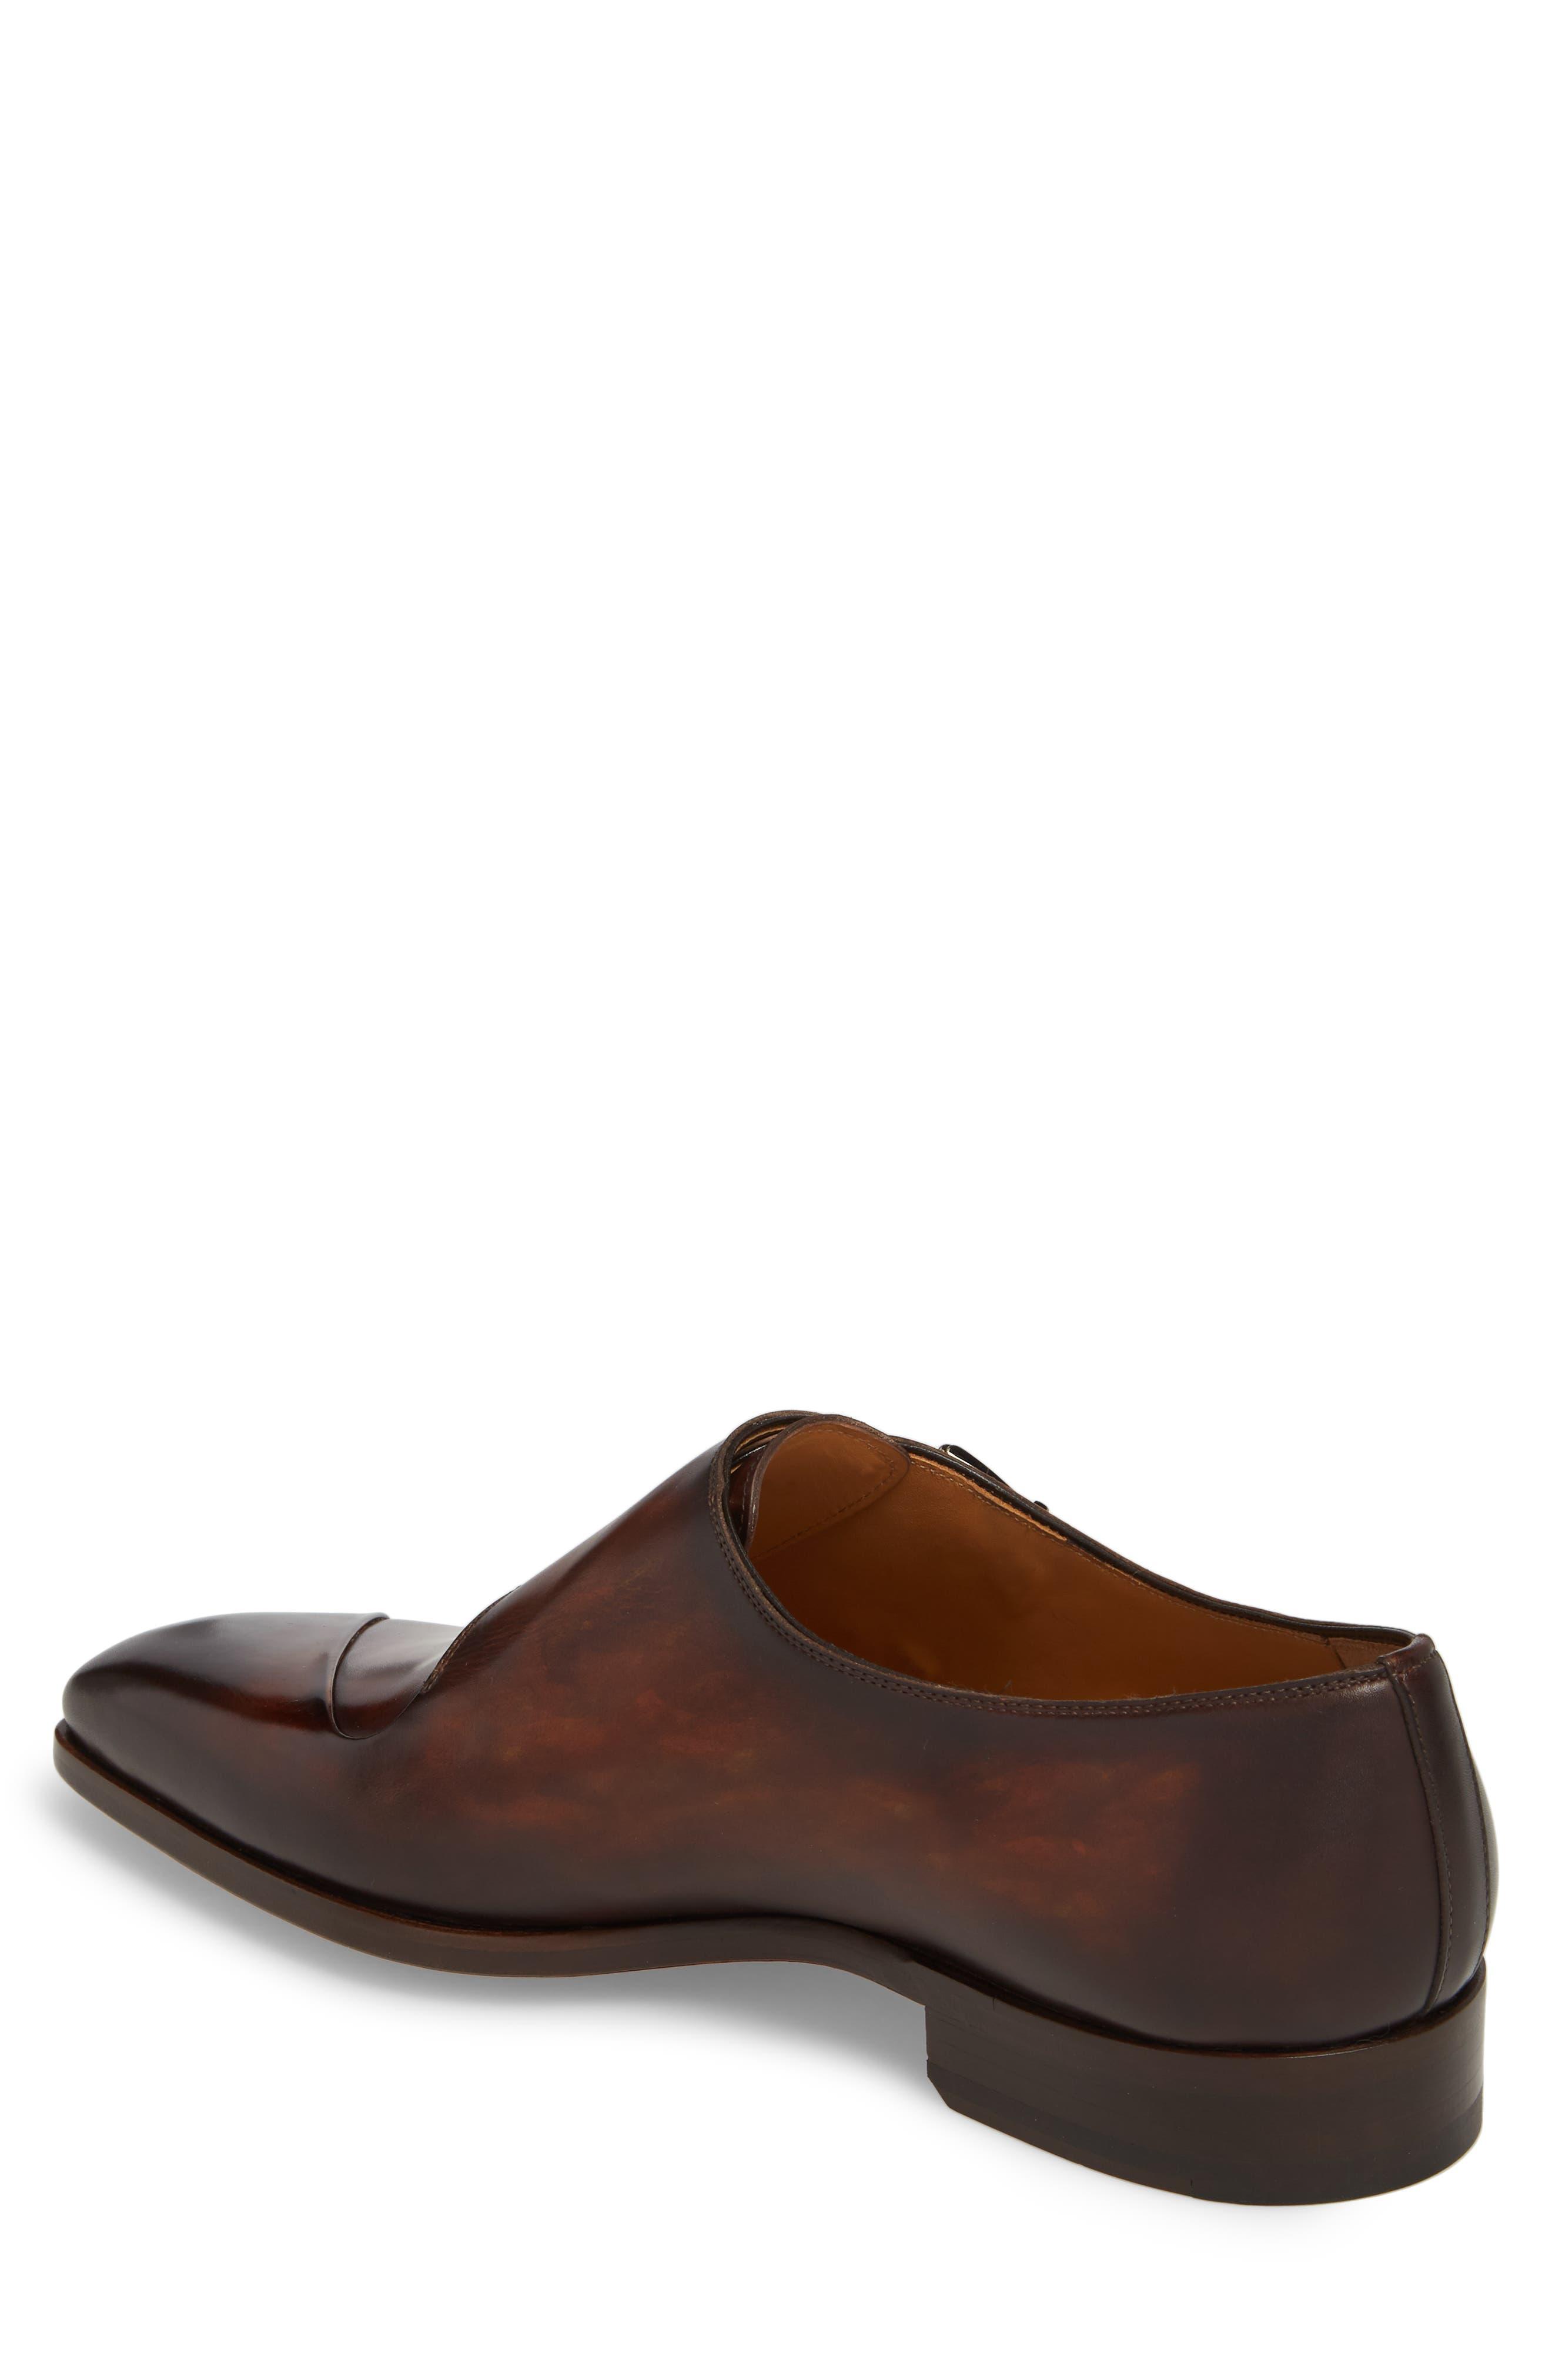 Hafiz Double Strap Monk Shoe,                             Alternate thumbnail 2, color,                             Tabaco Leather